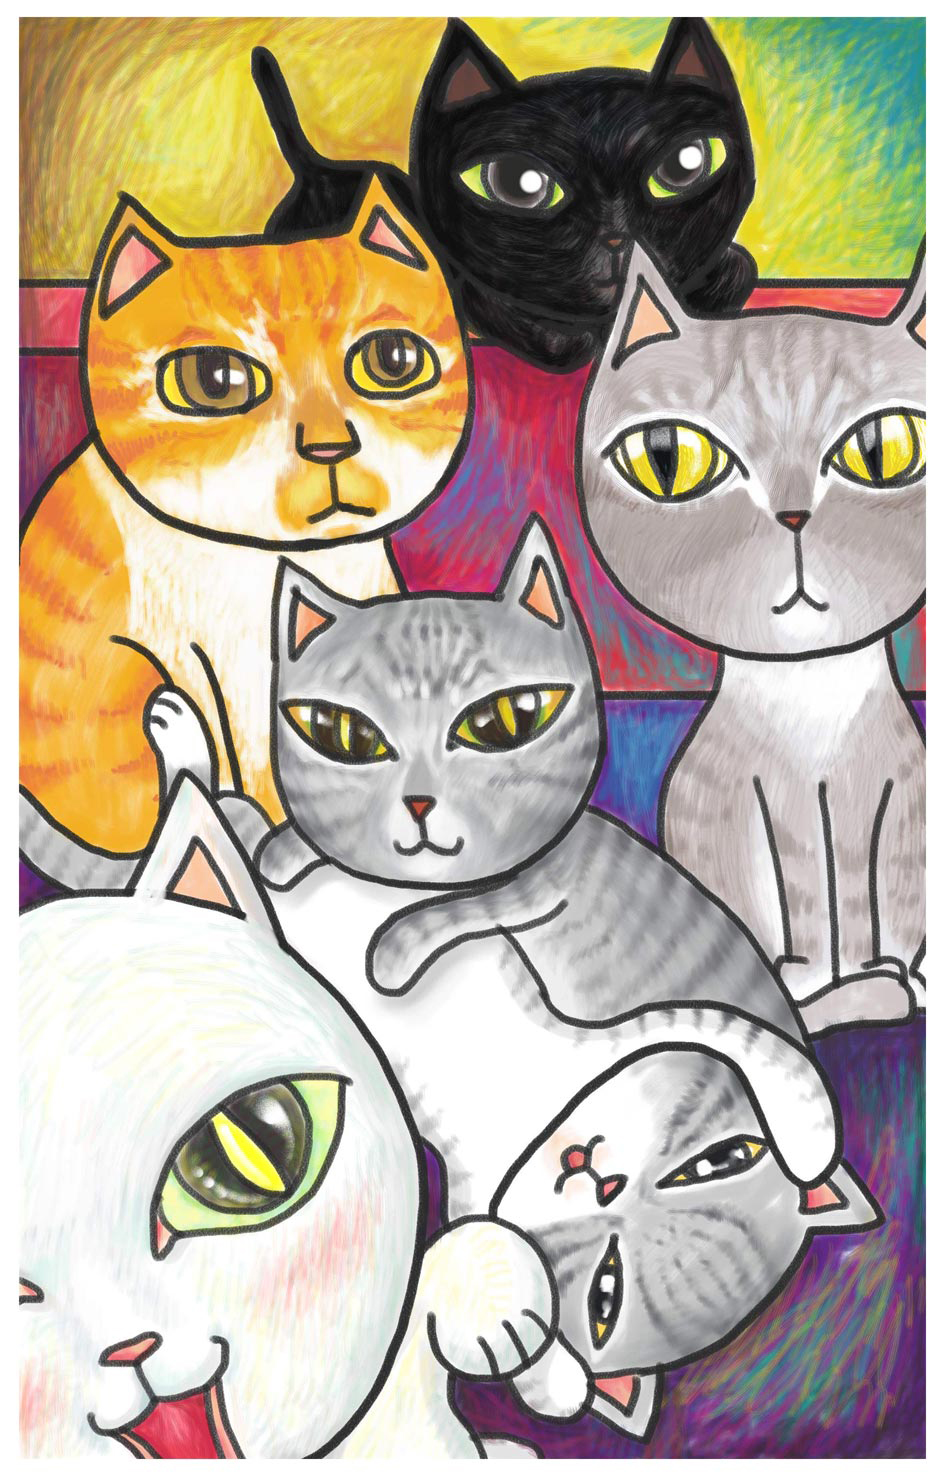 6cats_bak.jpg